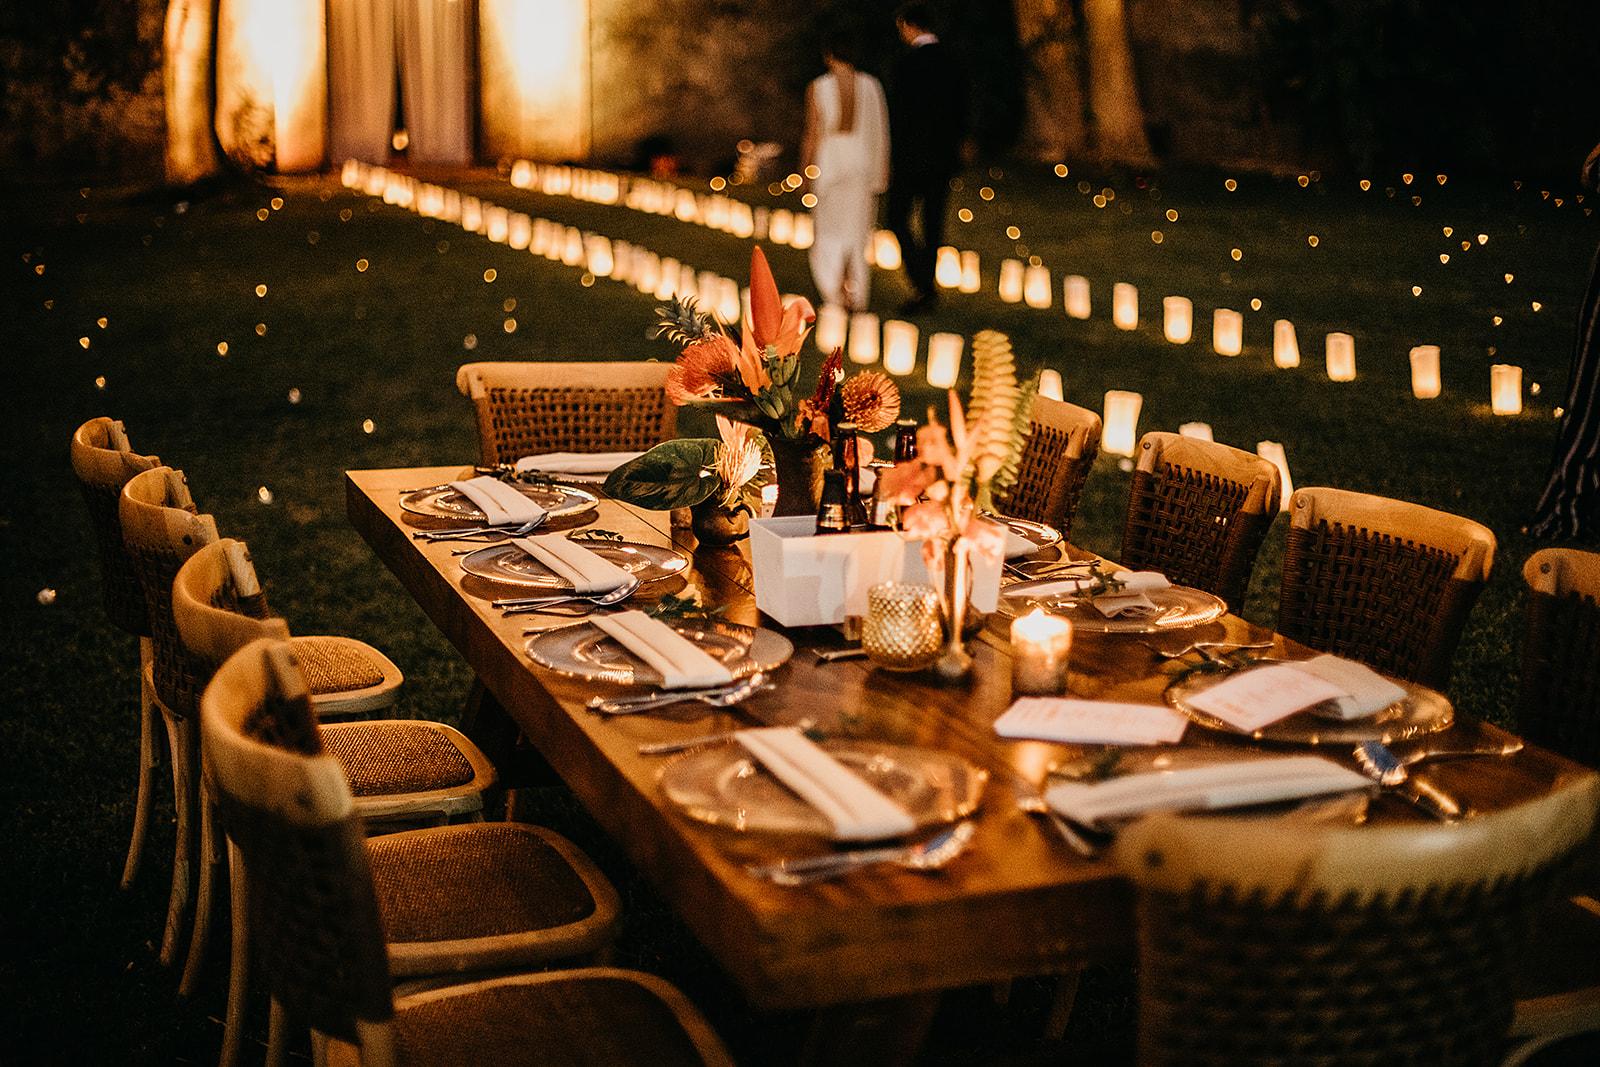 AmandaMarkus-Hacienda-Sac-Chich-Merida-Wedding-649_websize.jpg